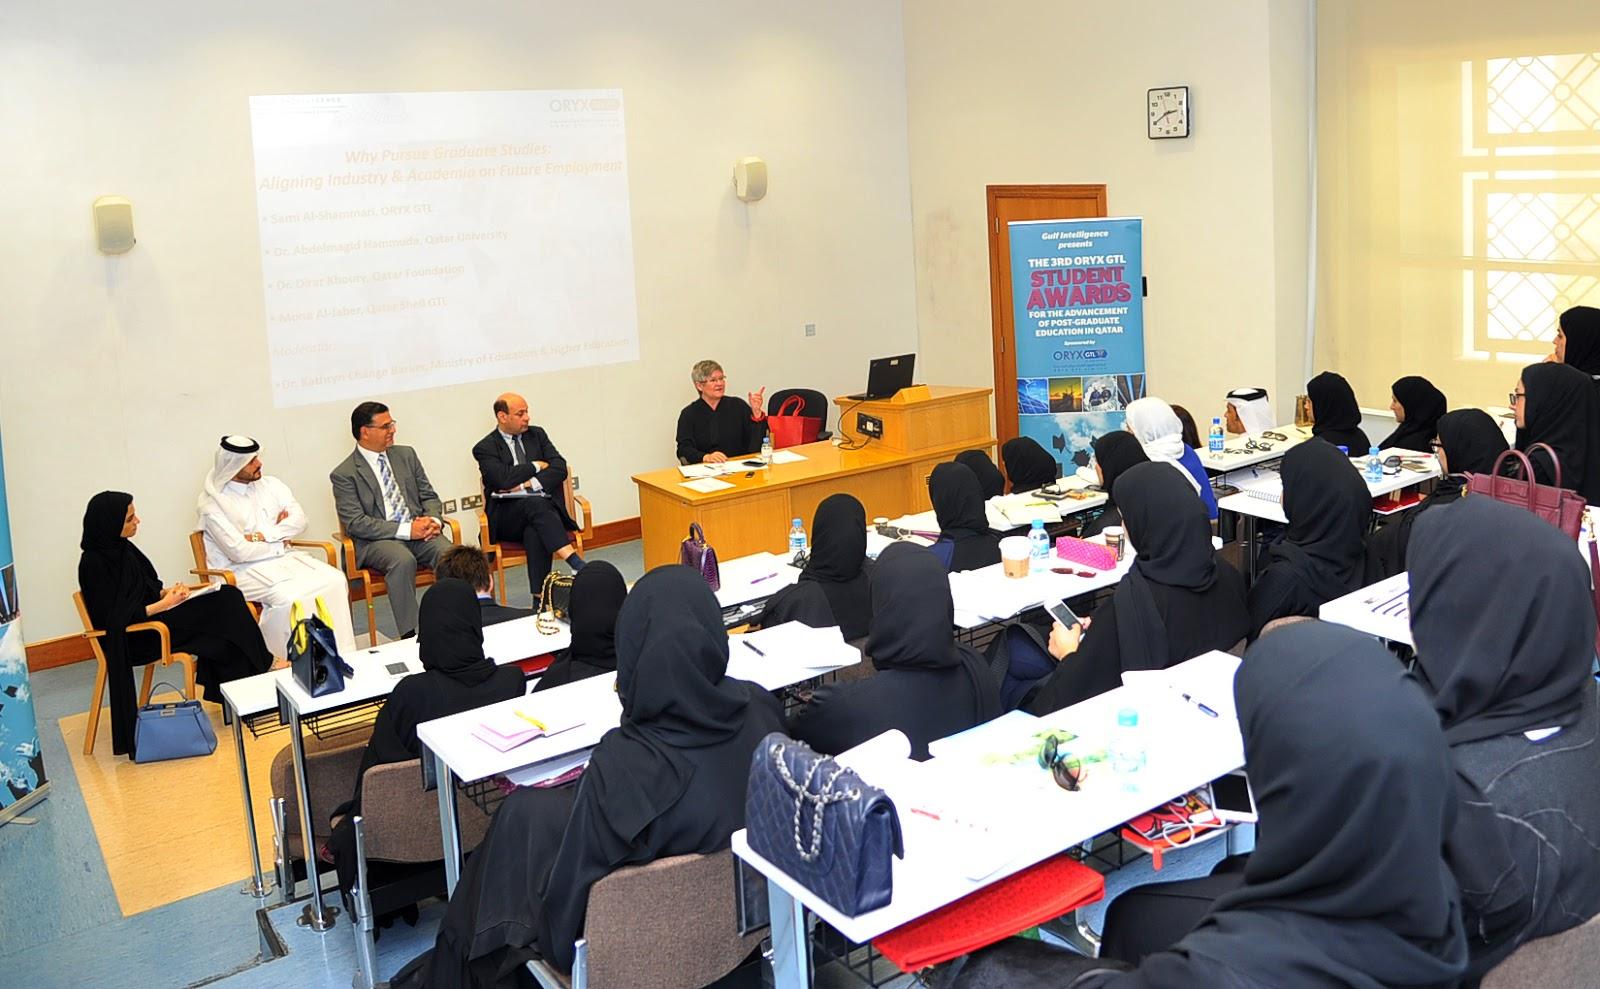 Qatar's Energy Industry & Academia to Bridge Gap by 2021